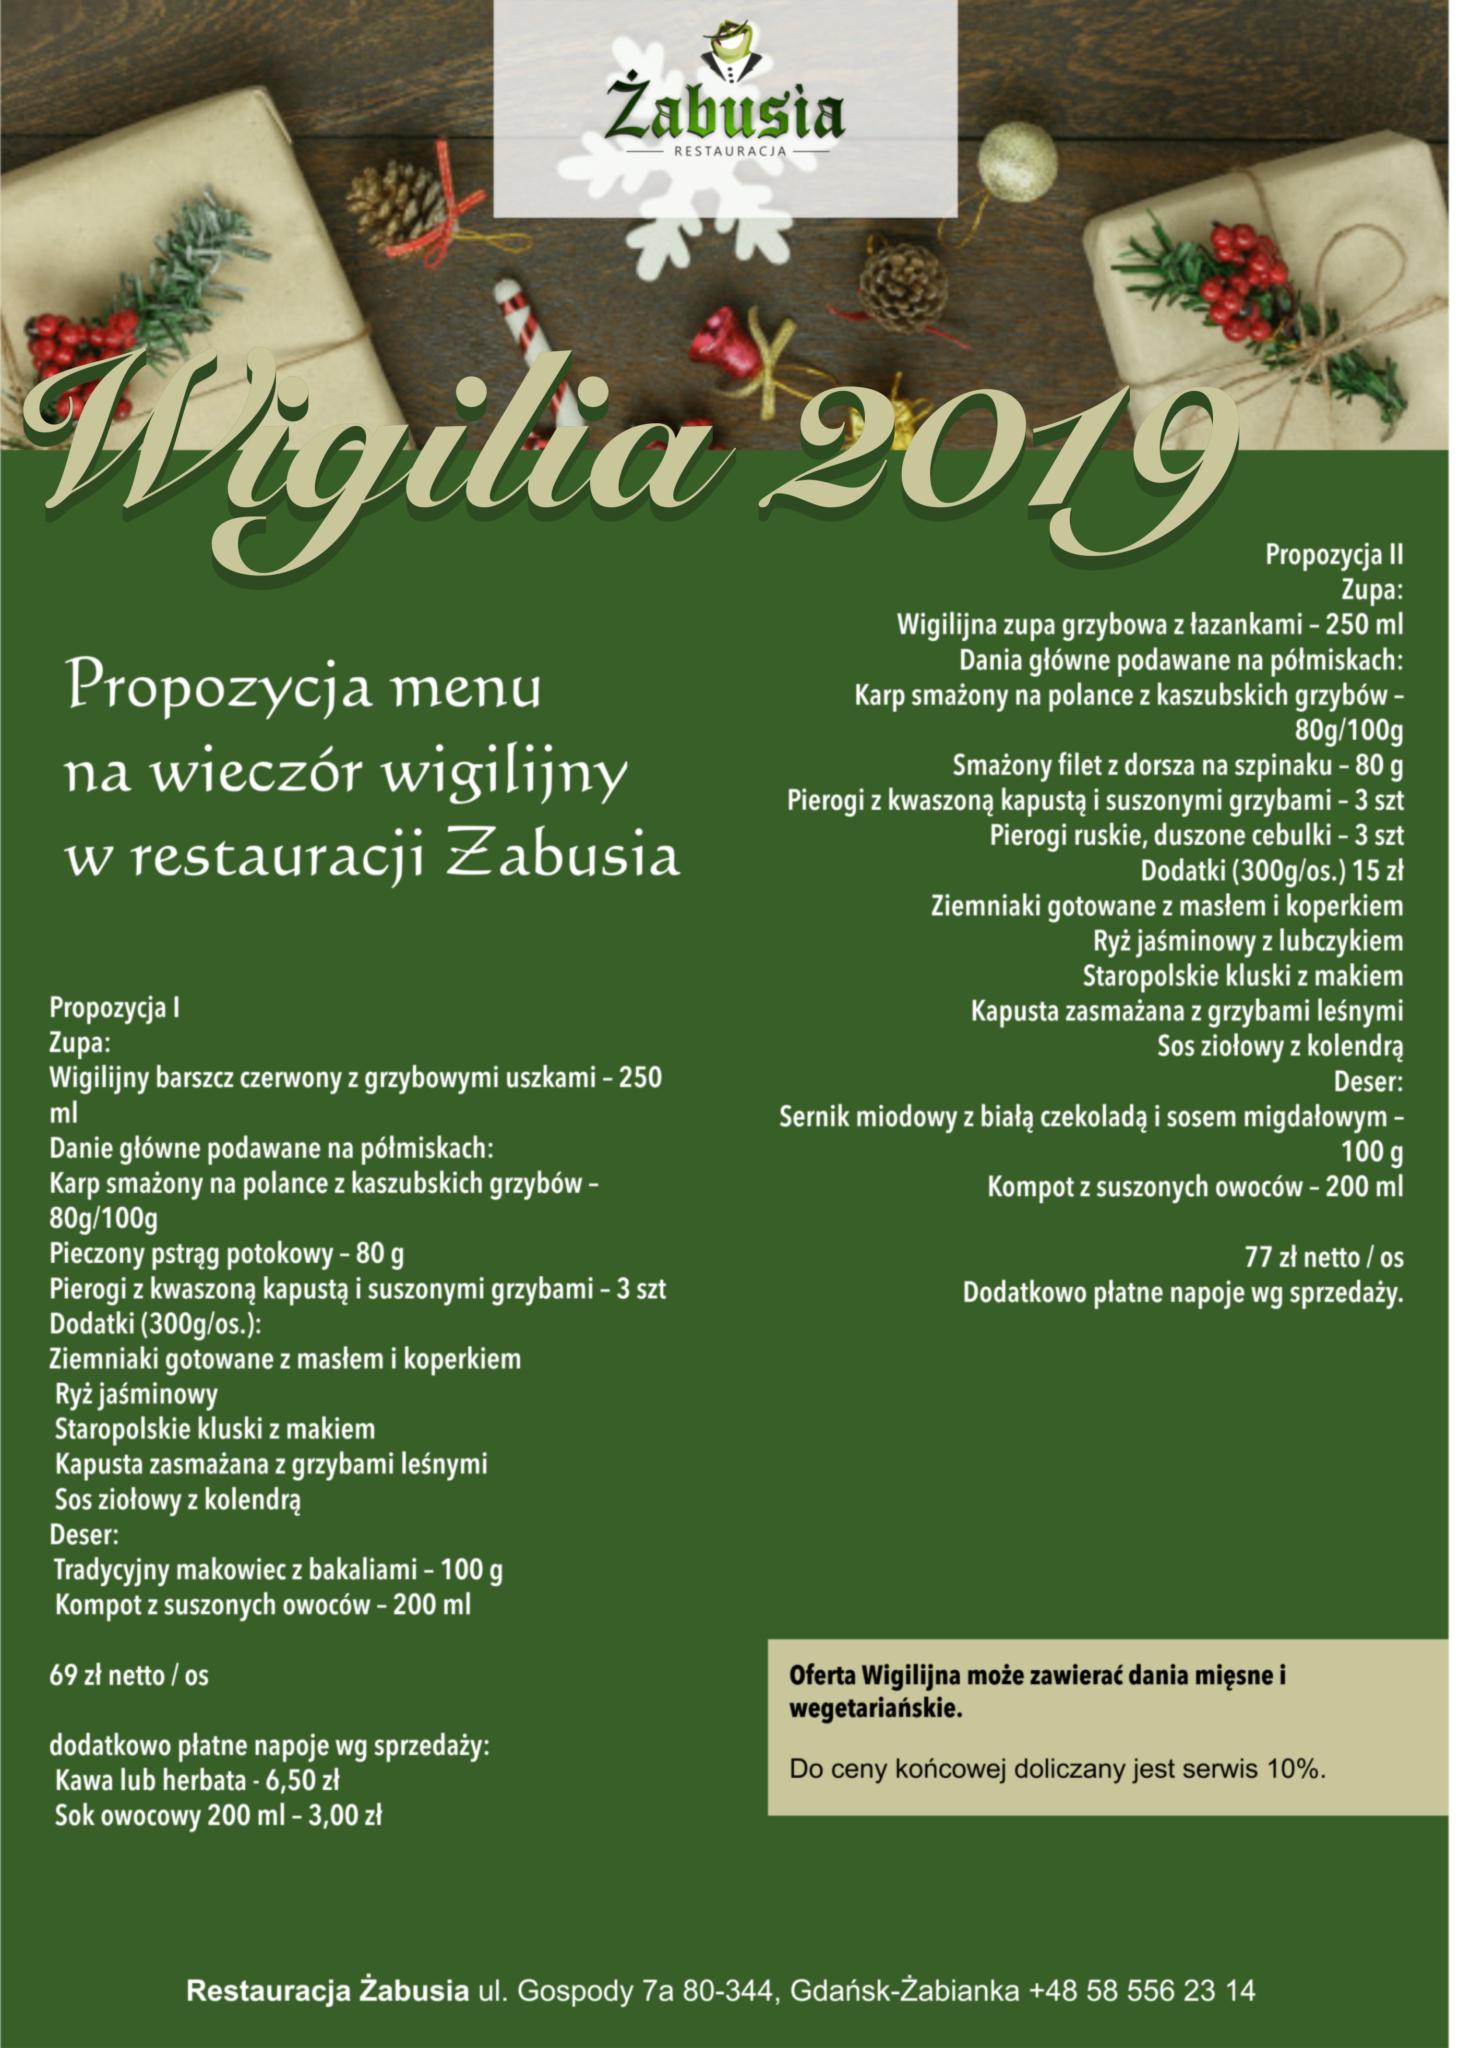 Menu Wigilijne 2019